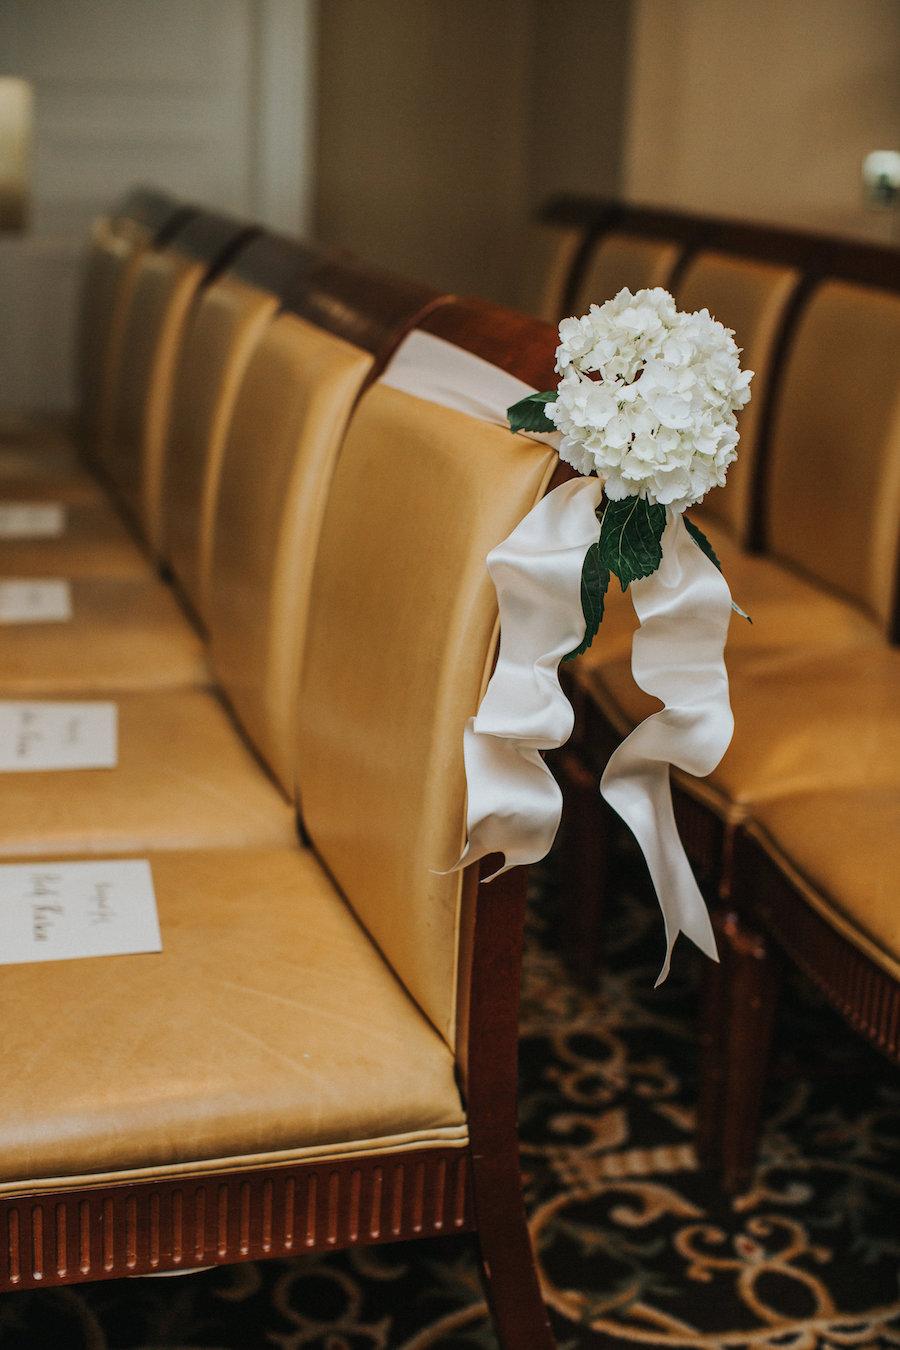 Elegant White Hydrangea Wedding Ceremony Aisle Flowers and Decor